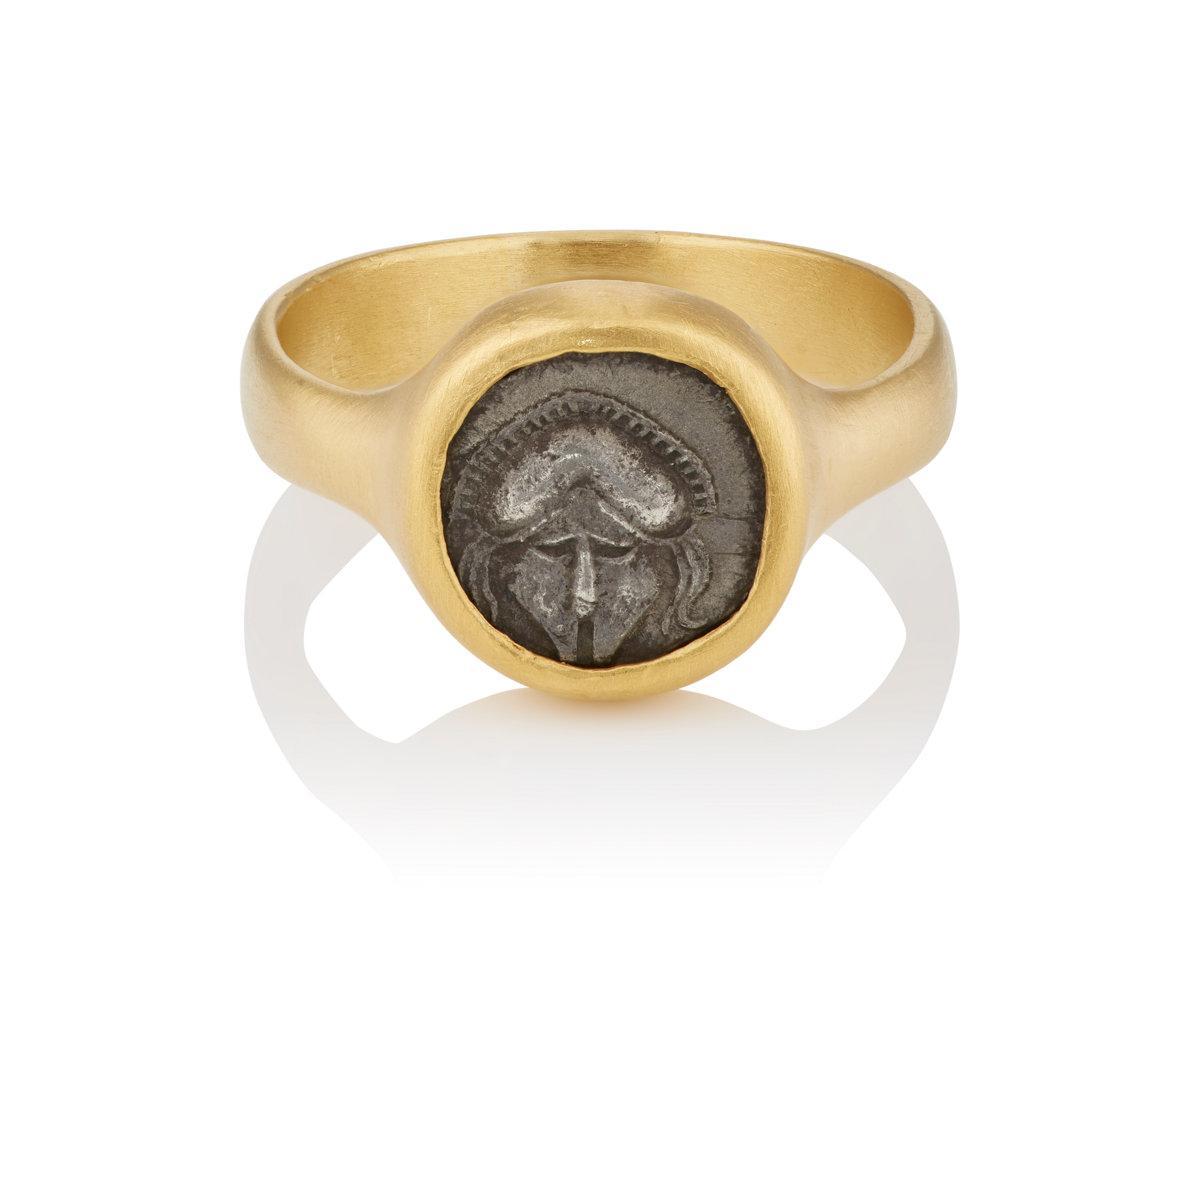 Eli Halili Womens Ancient Corinthian Helmet Coin Ring LQdb0fsK